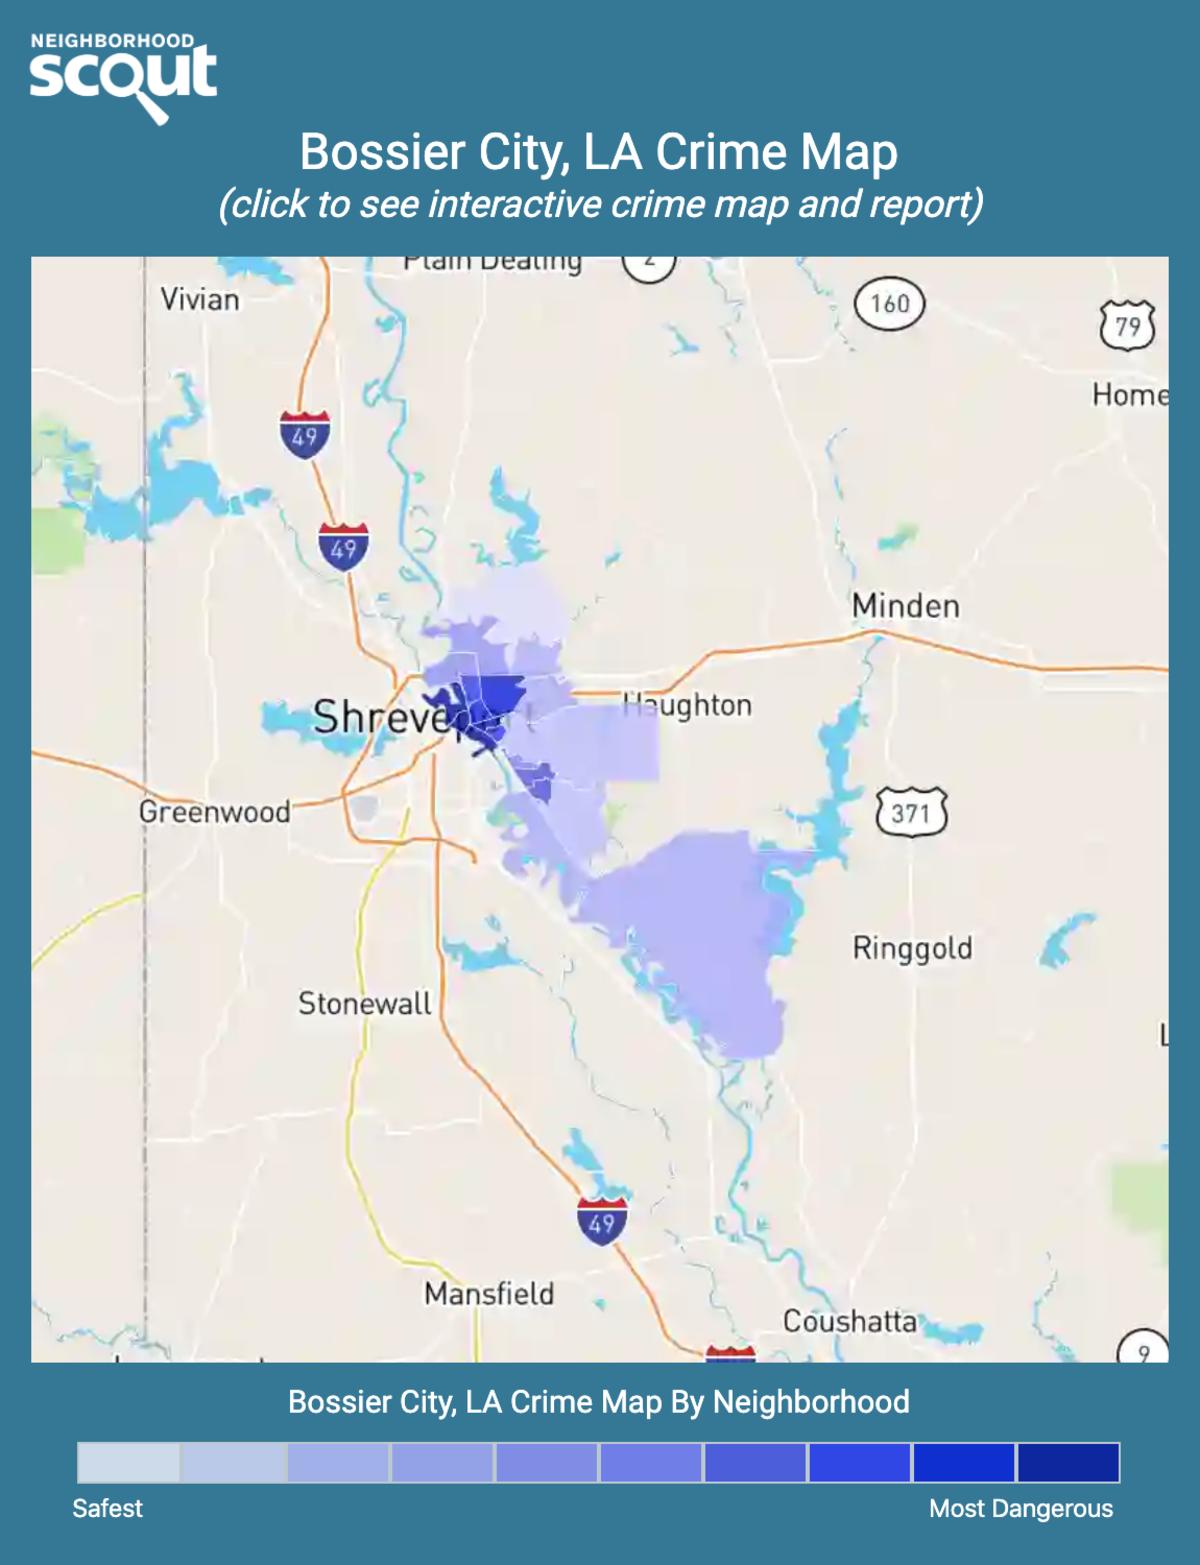 Bossier City, Louisiana crime map